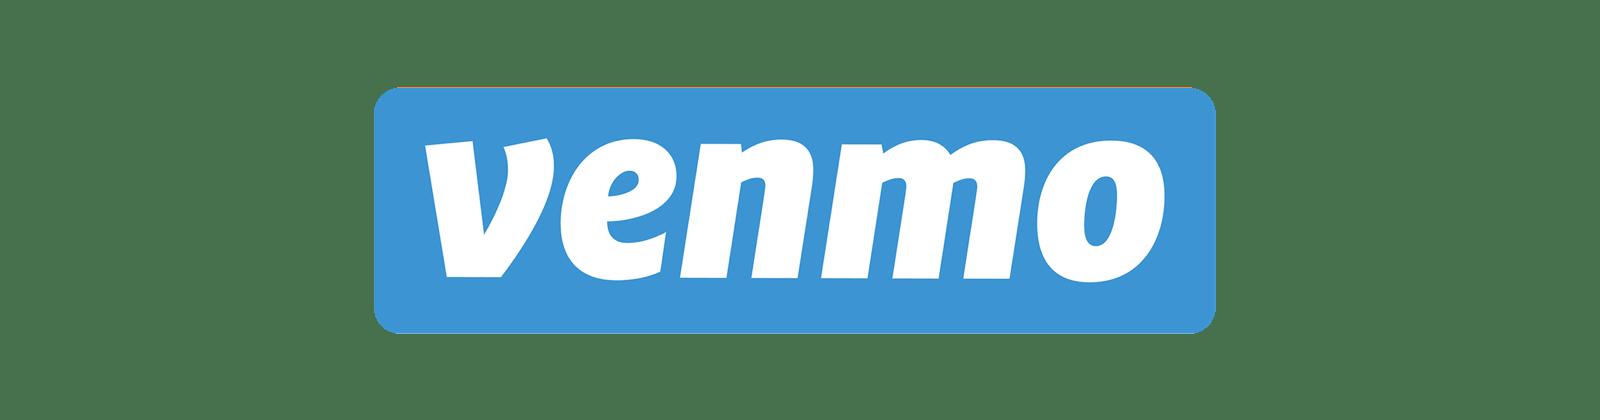 Venmo Security And Privacy Guide 2020 - Defending Digital - Venmo Logo PNG